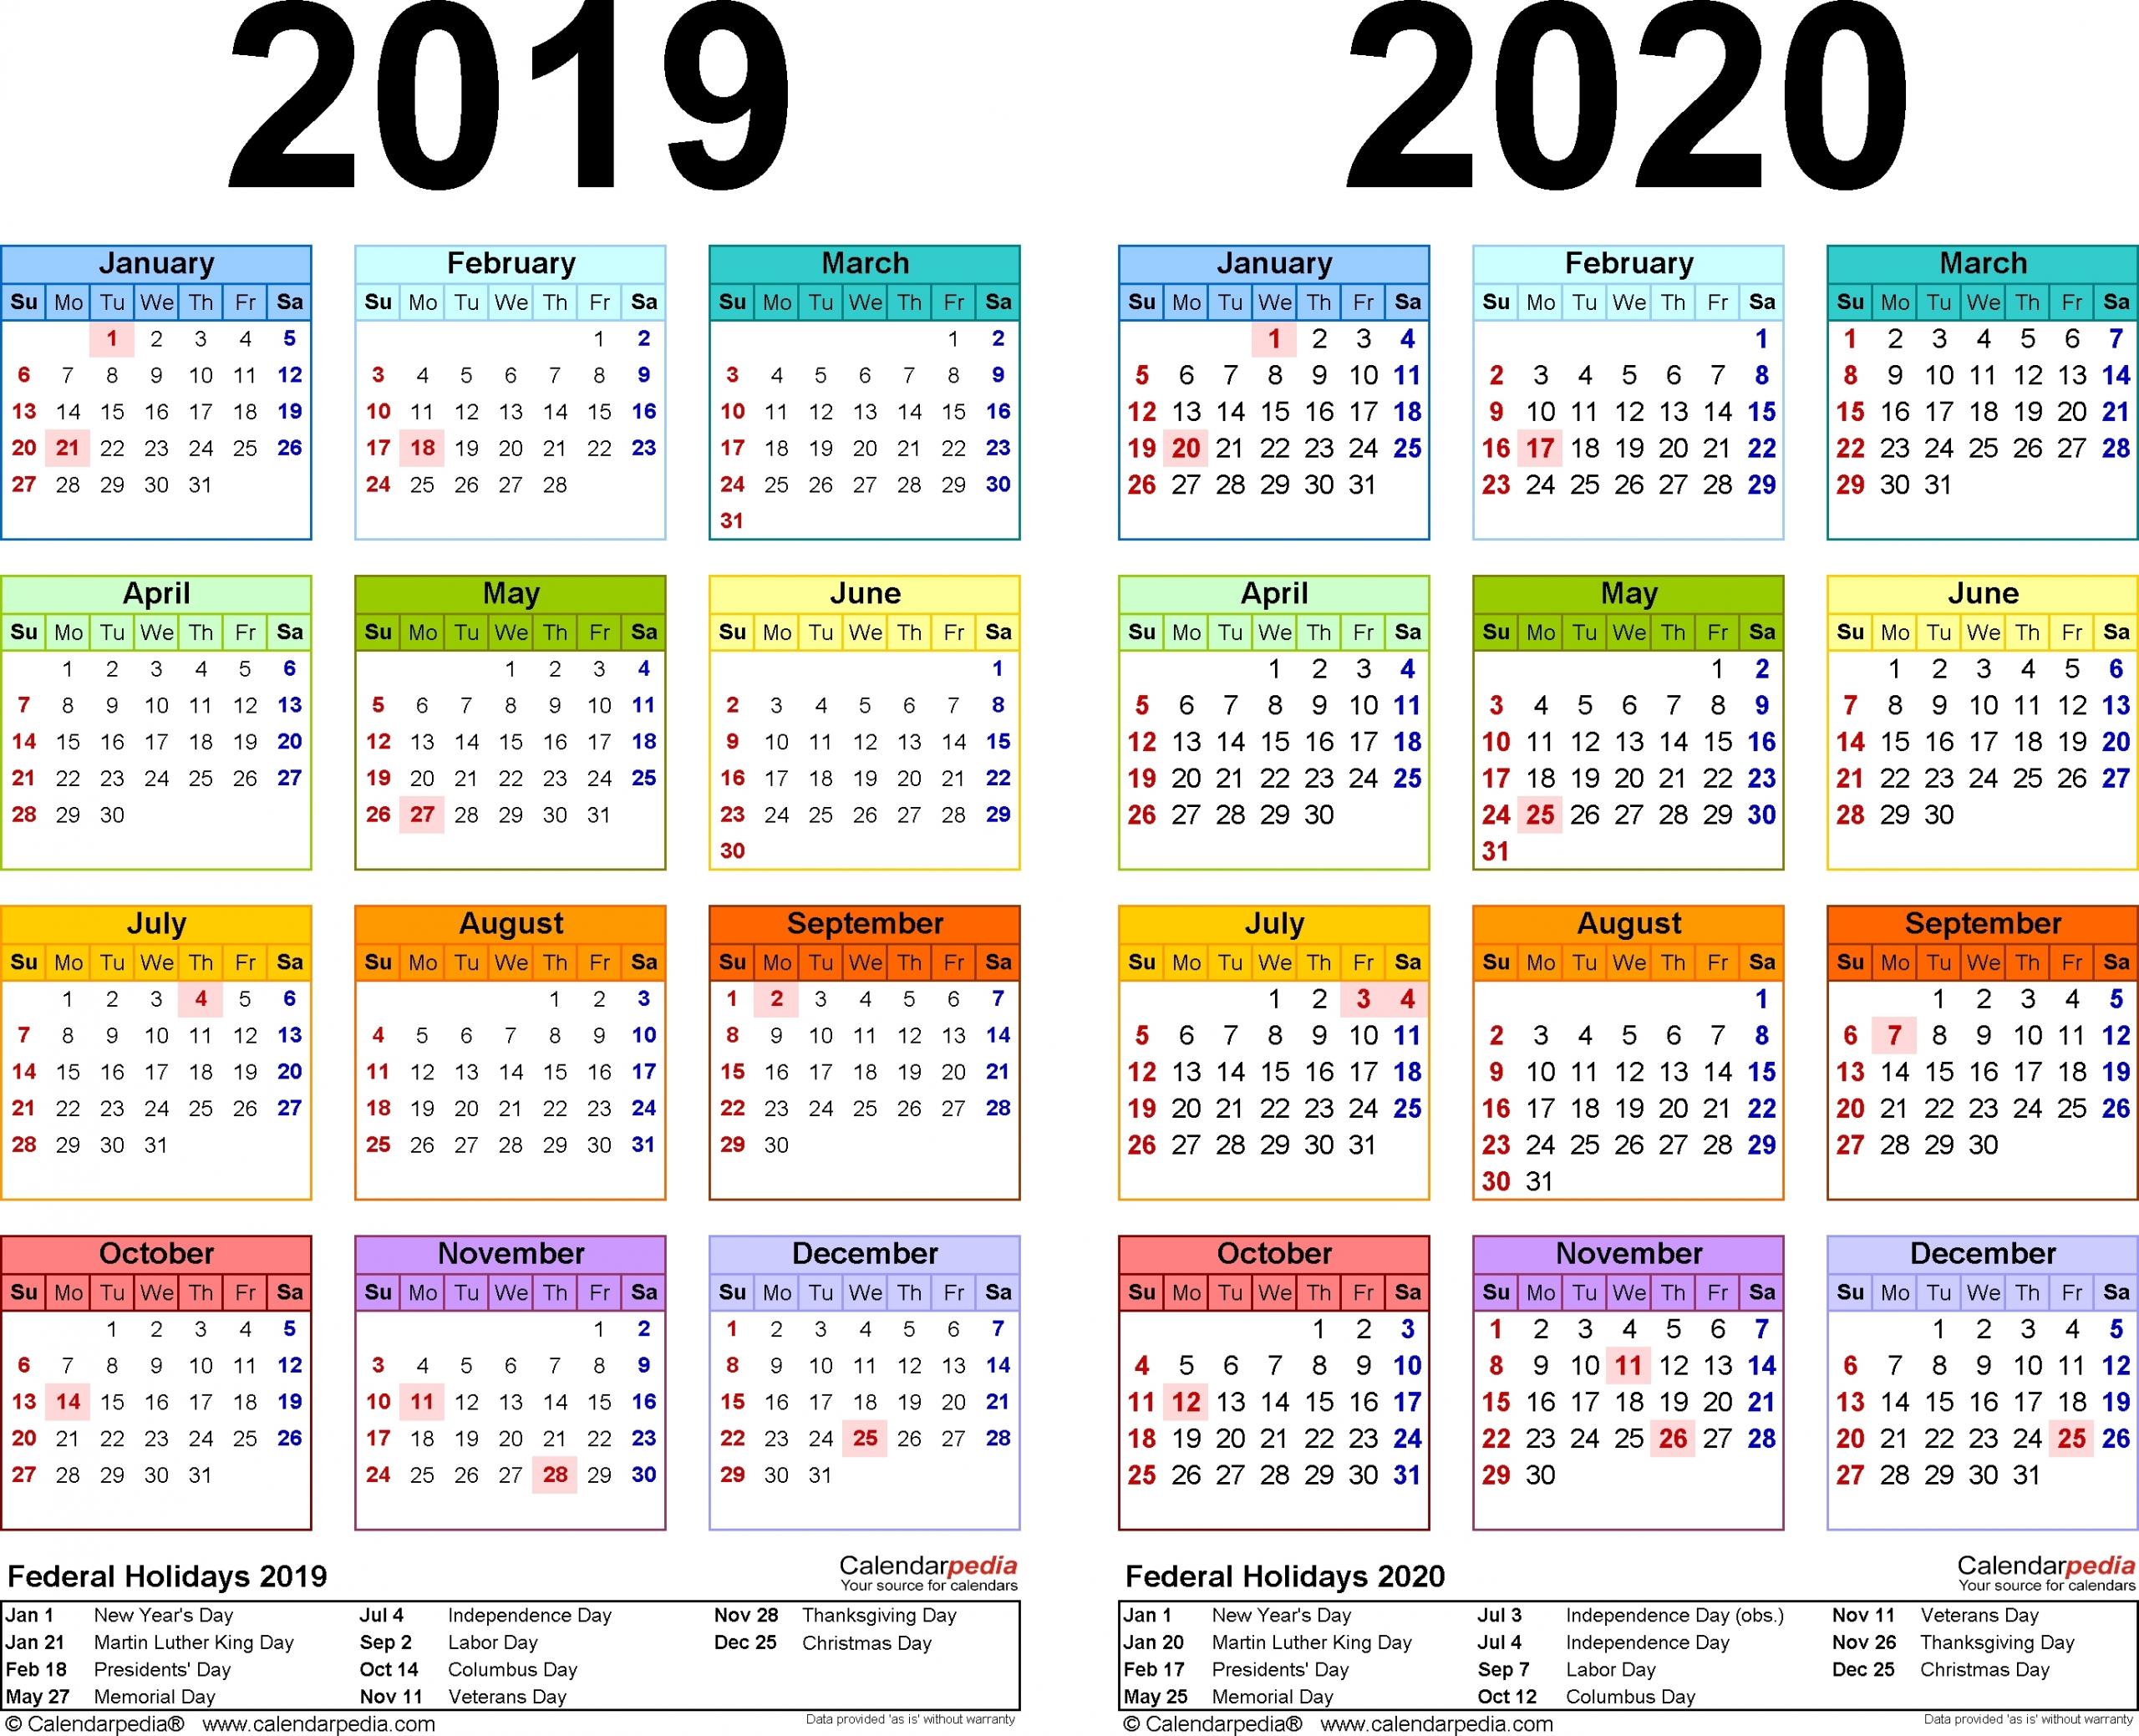 printable calendar 2019 2020 year at a glance calendar